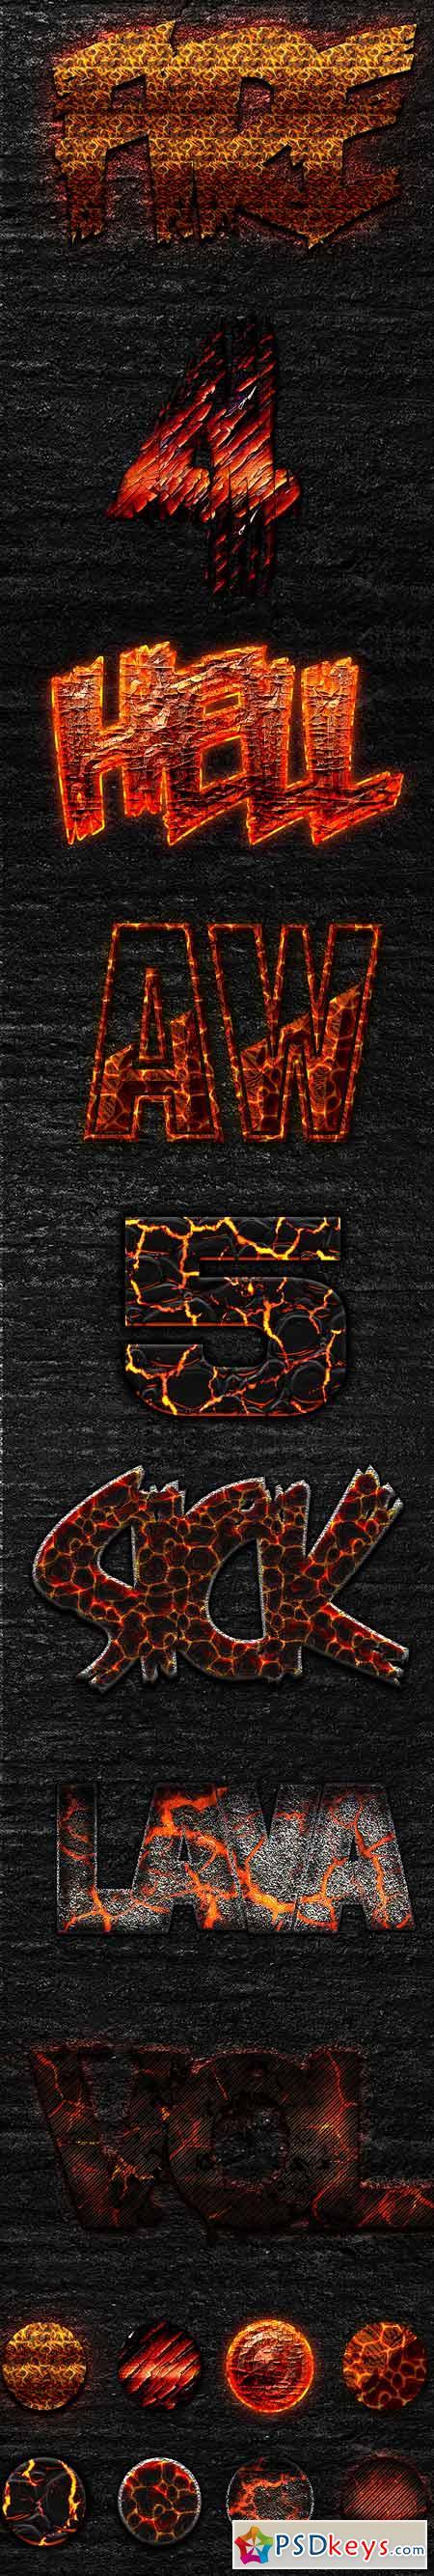 Best Burn & Lava Text Styles 2015 13494487